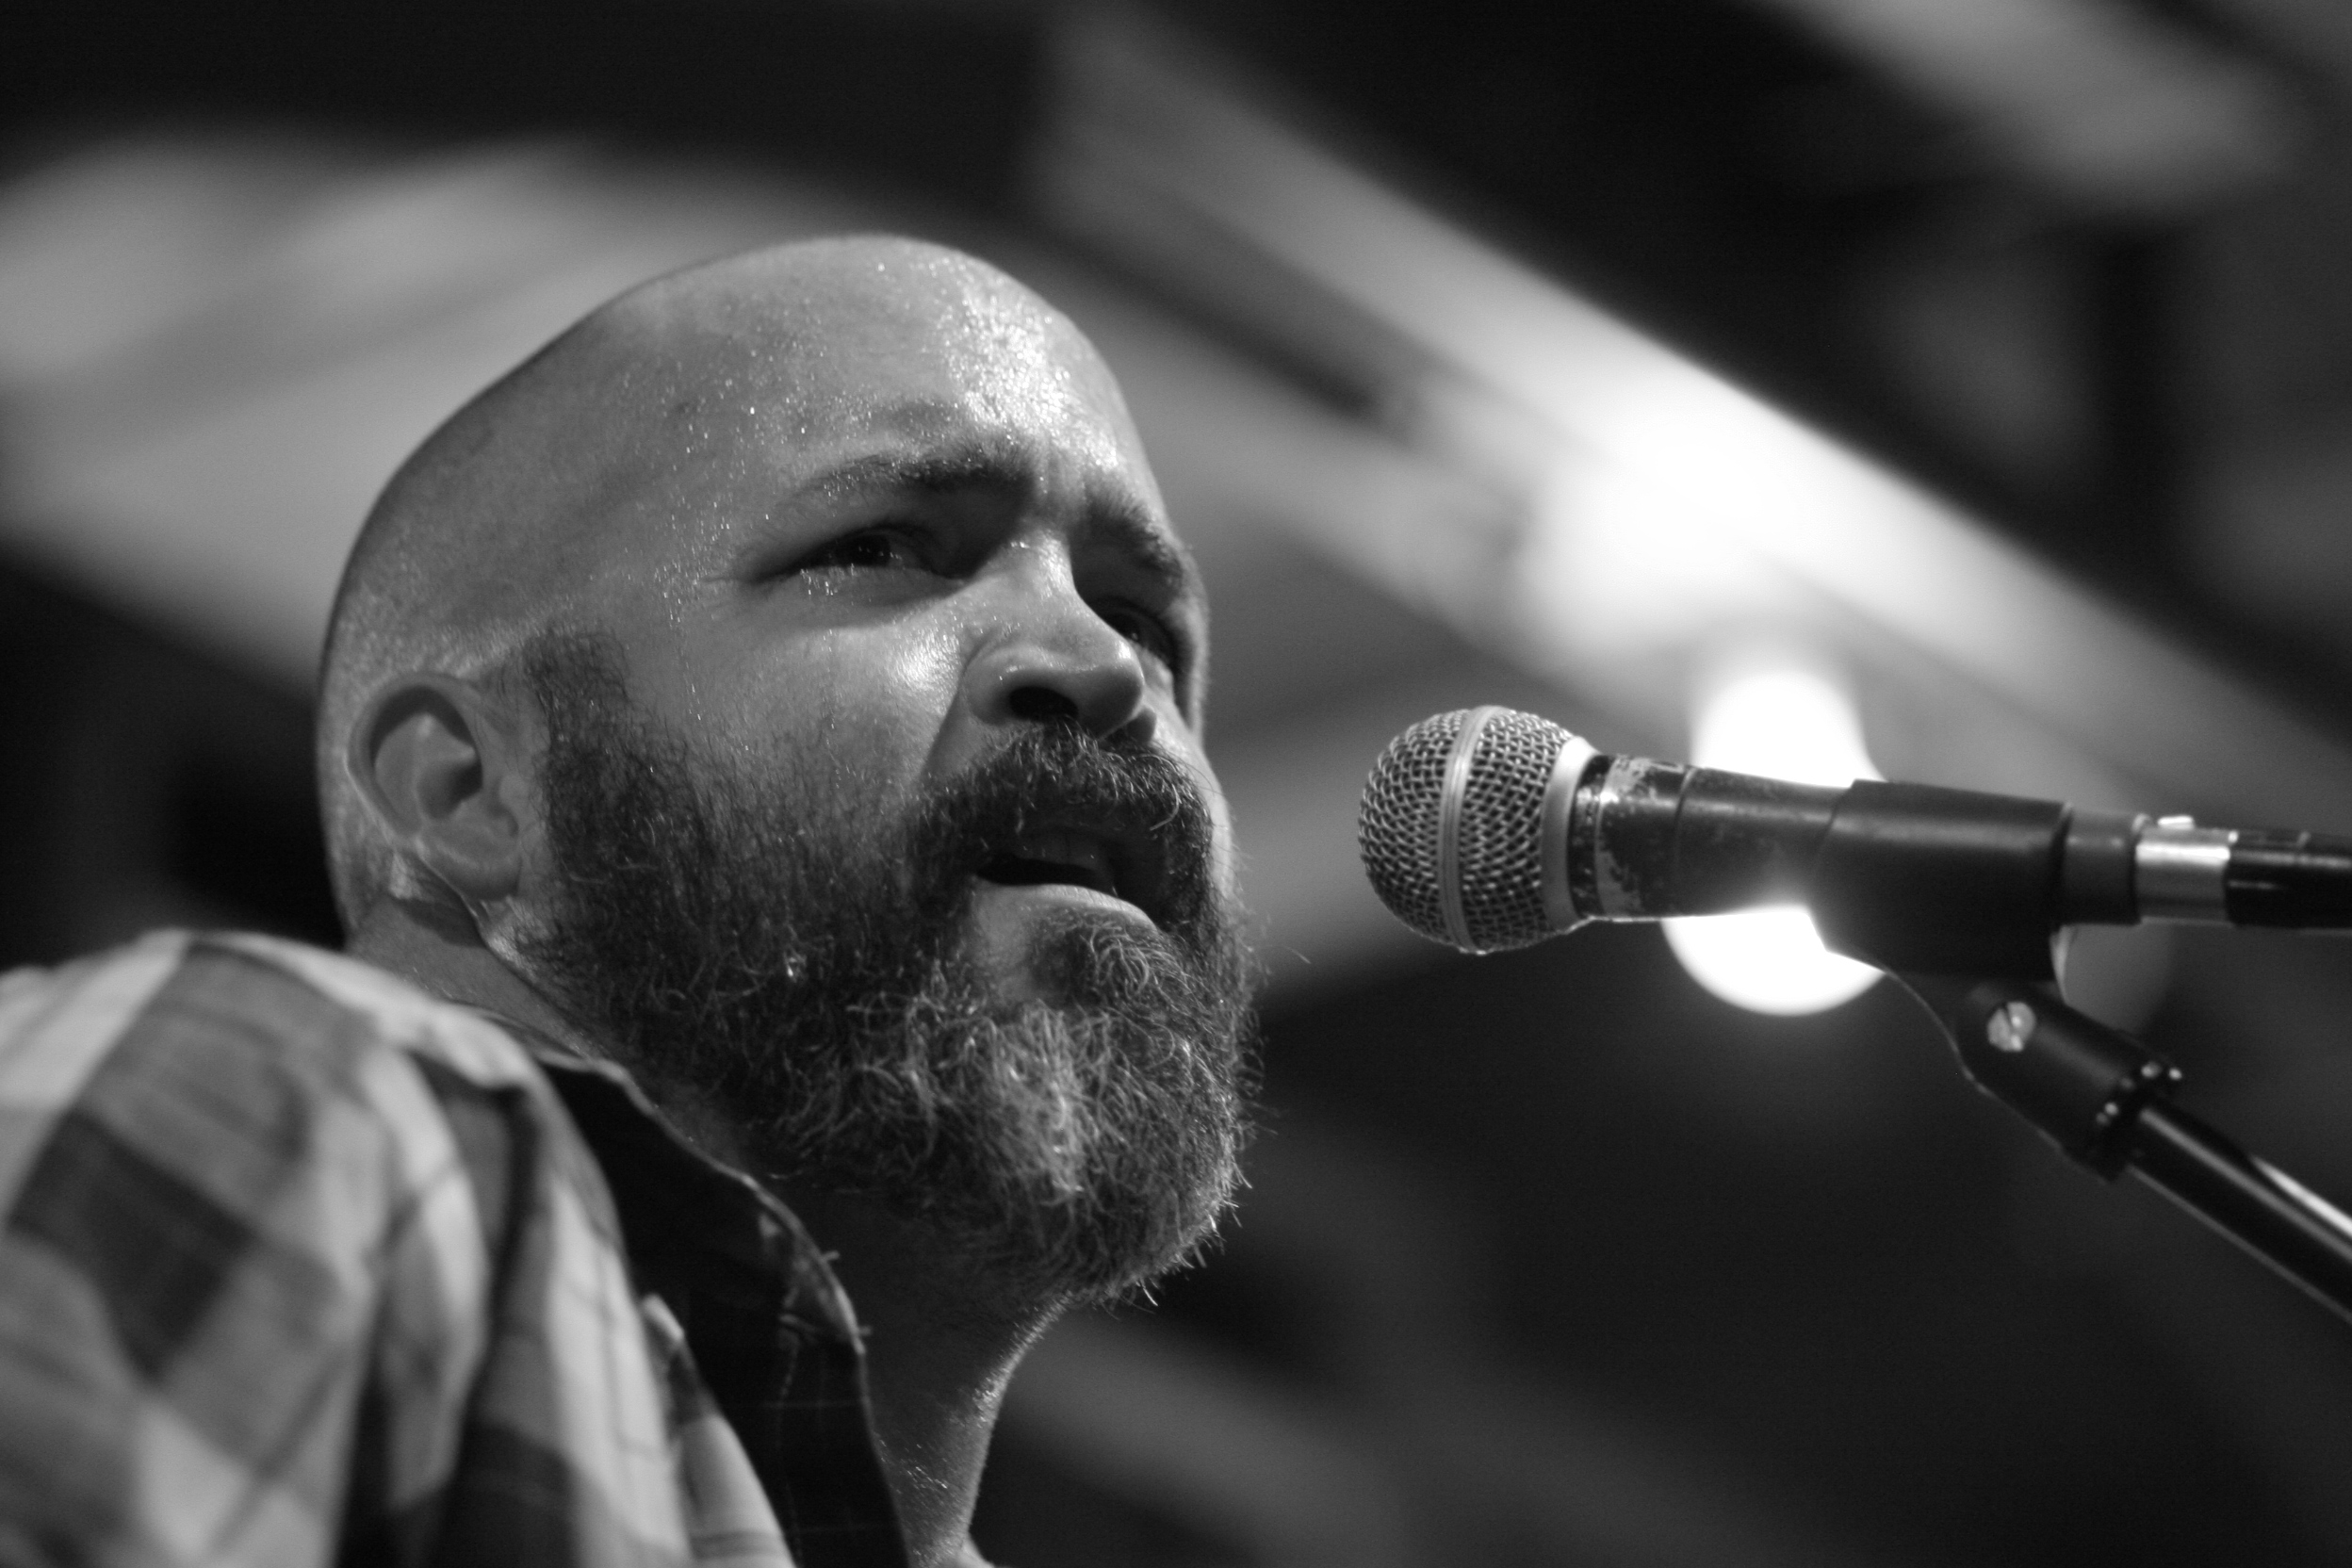 Justin Murray of Devil's Hollow at Gruene Hall, New Braunfels, Texas. Photo by Chris Wissman | 2010